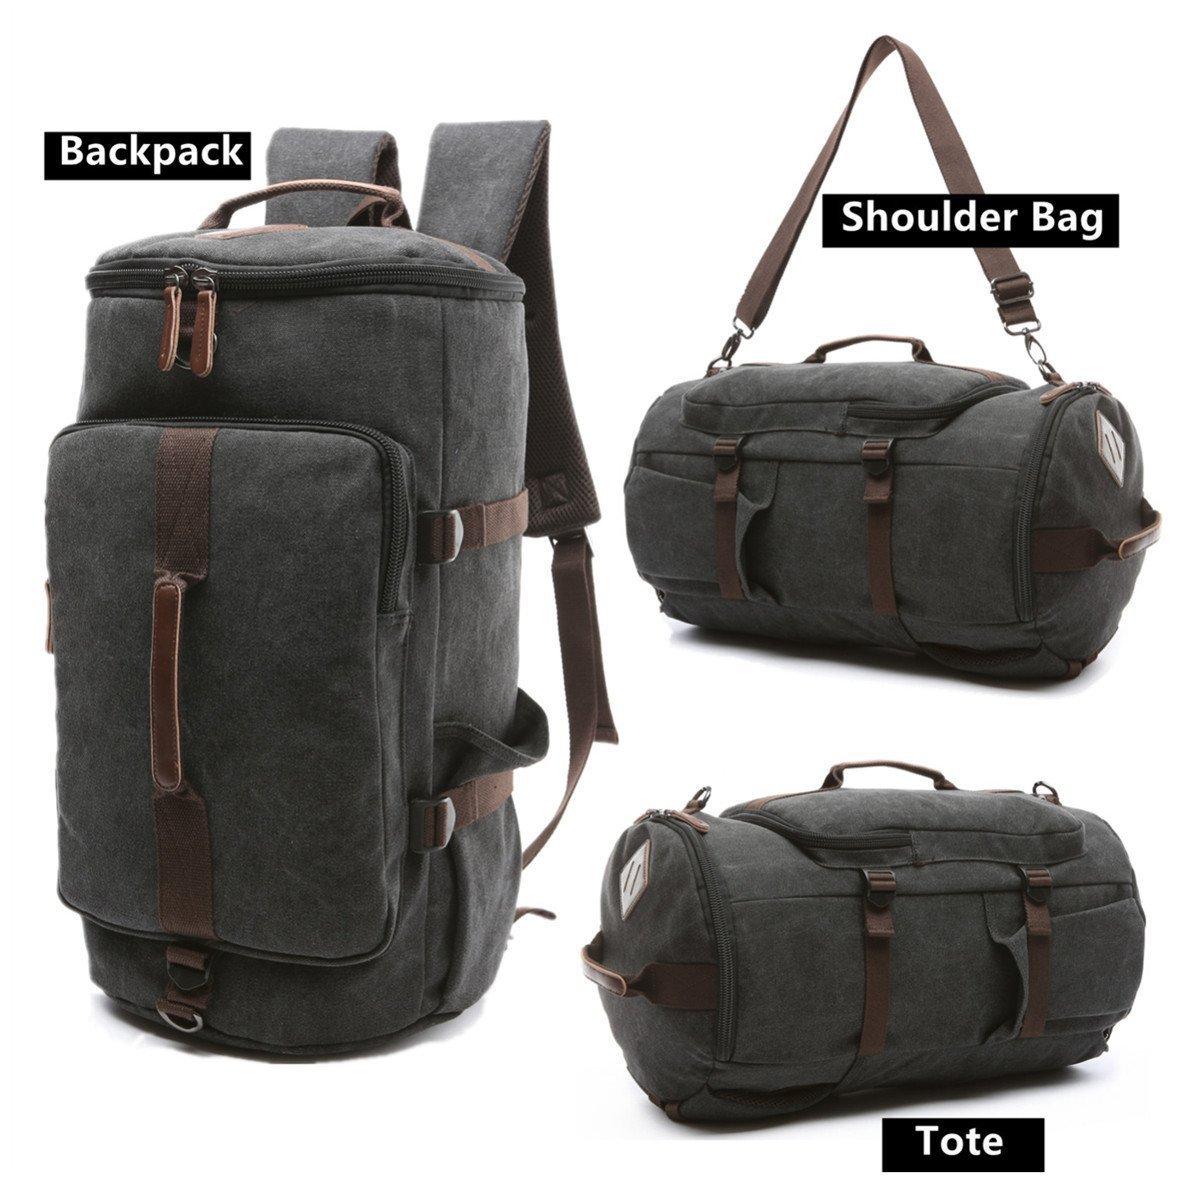 BAOSHA HB-26 Canvas Men Weekend Travel Duffel Bag Backpack Hiking Rucksack